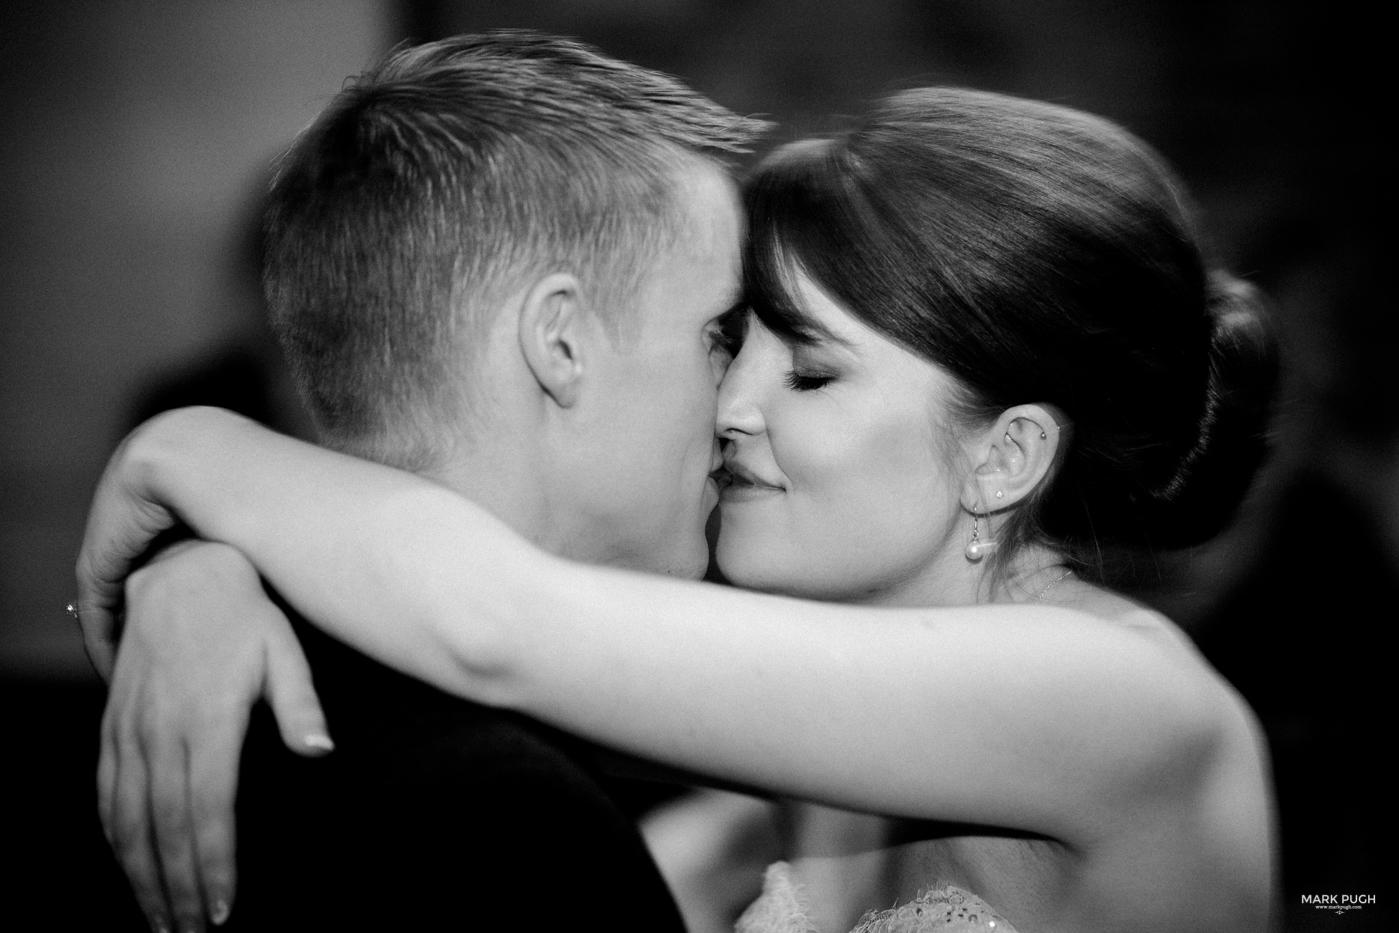 150 Wedding Photography Award winning Wedding Photographer and Videographer Mark Pugh www.markpugh.com.JPG